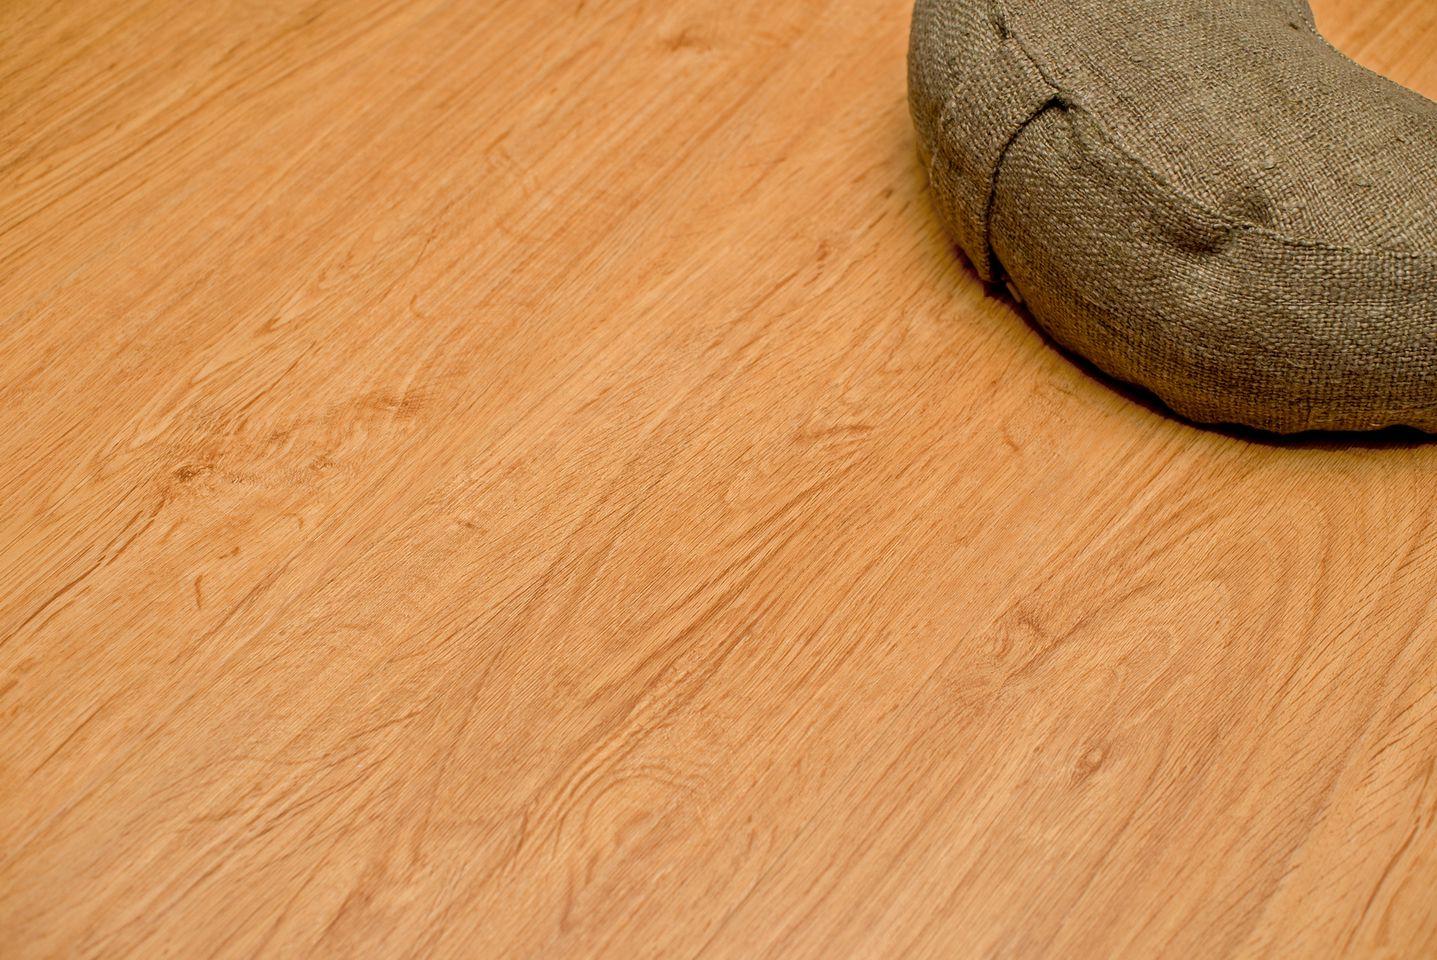 Floer dorpen pvc nisse natuur eiken bruine vloer vinyl kunststof